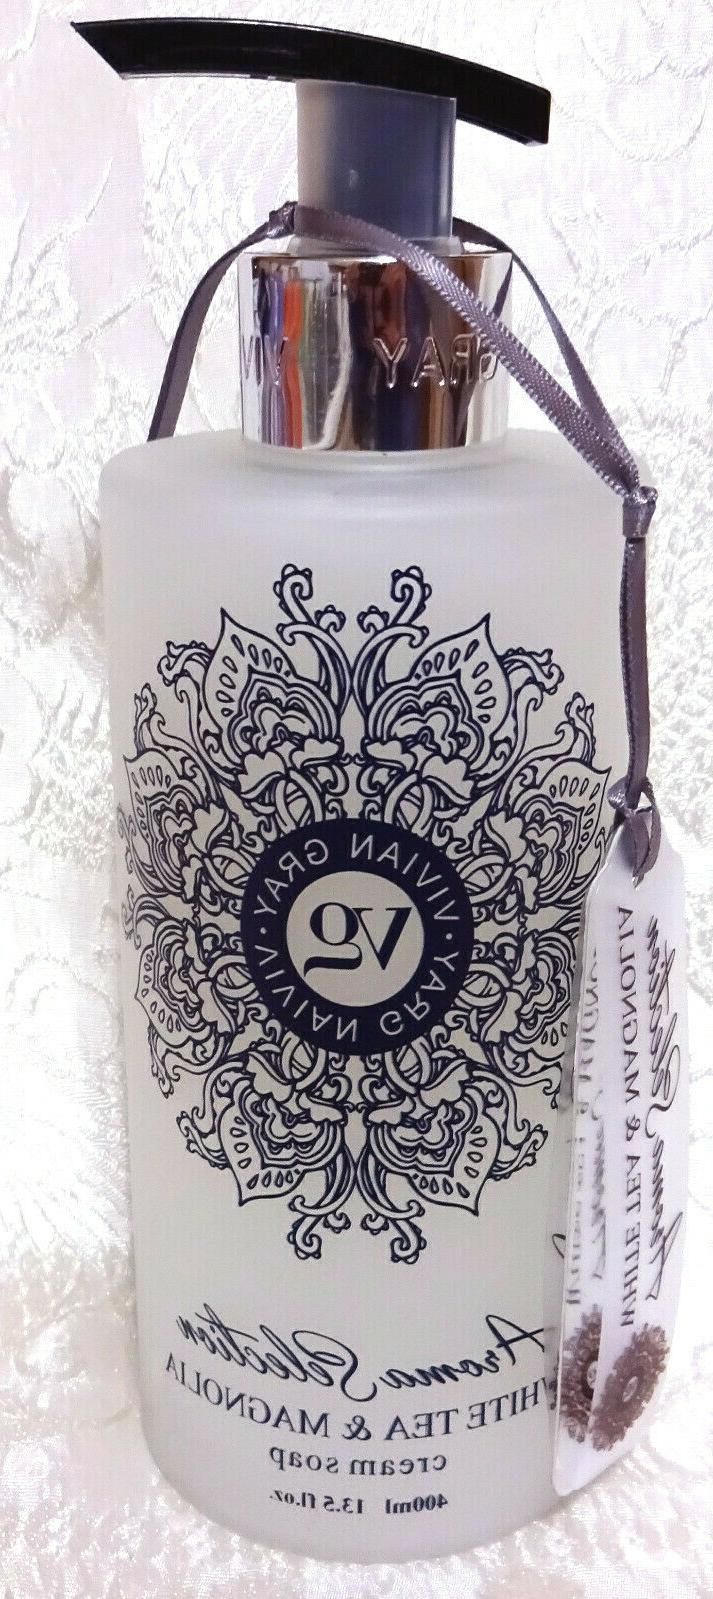 Vivian TEA & Cream Hand Soap in Germany X